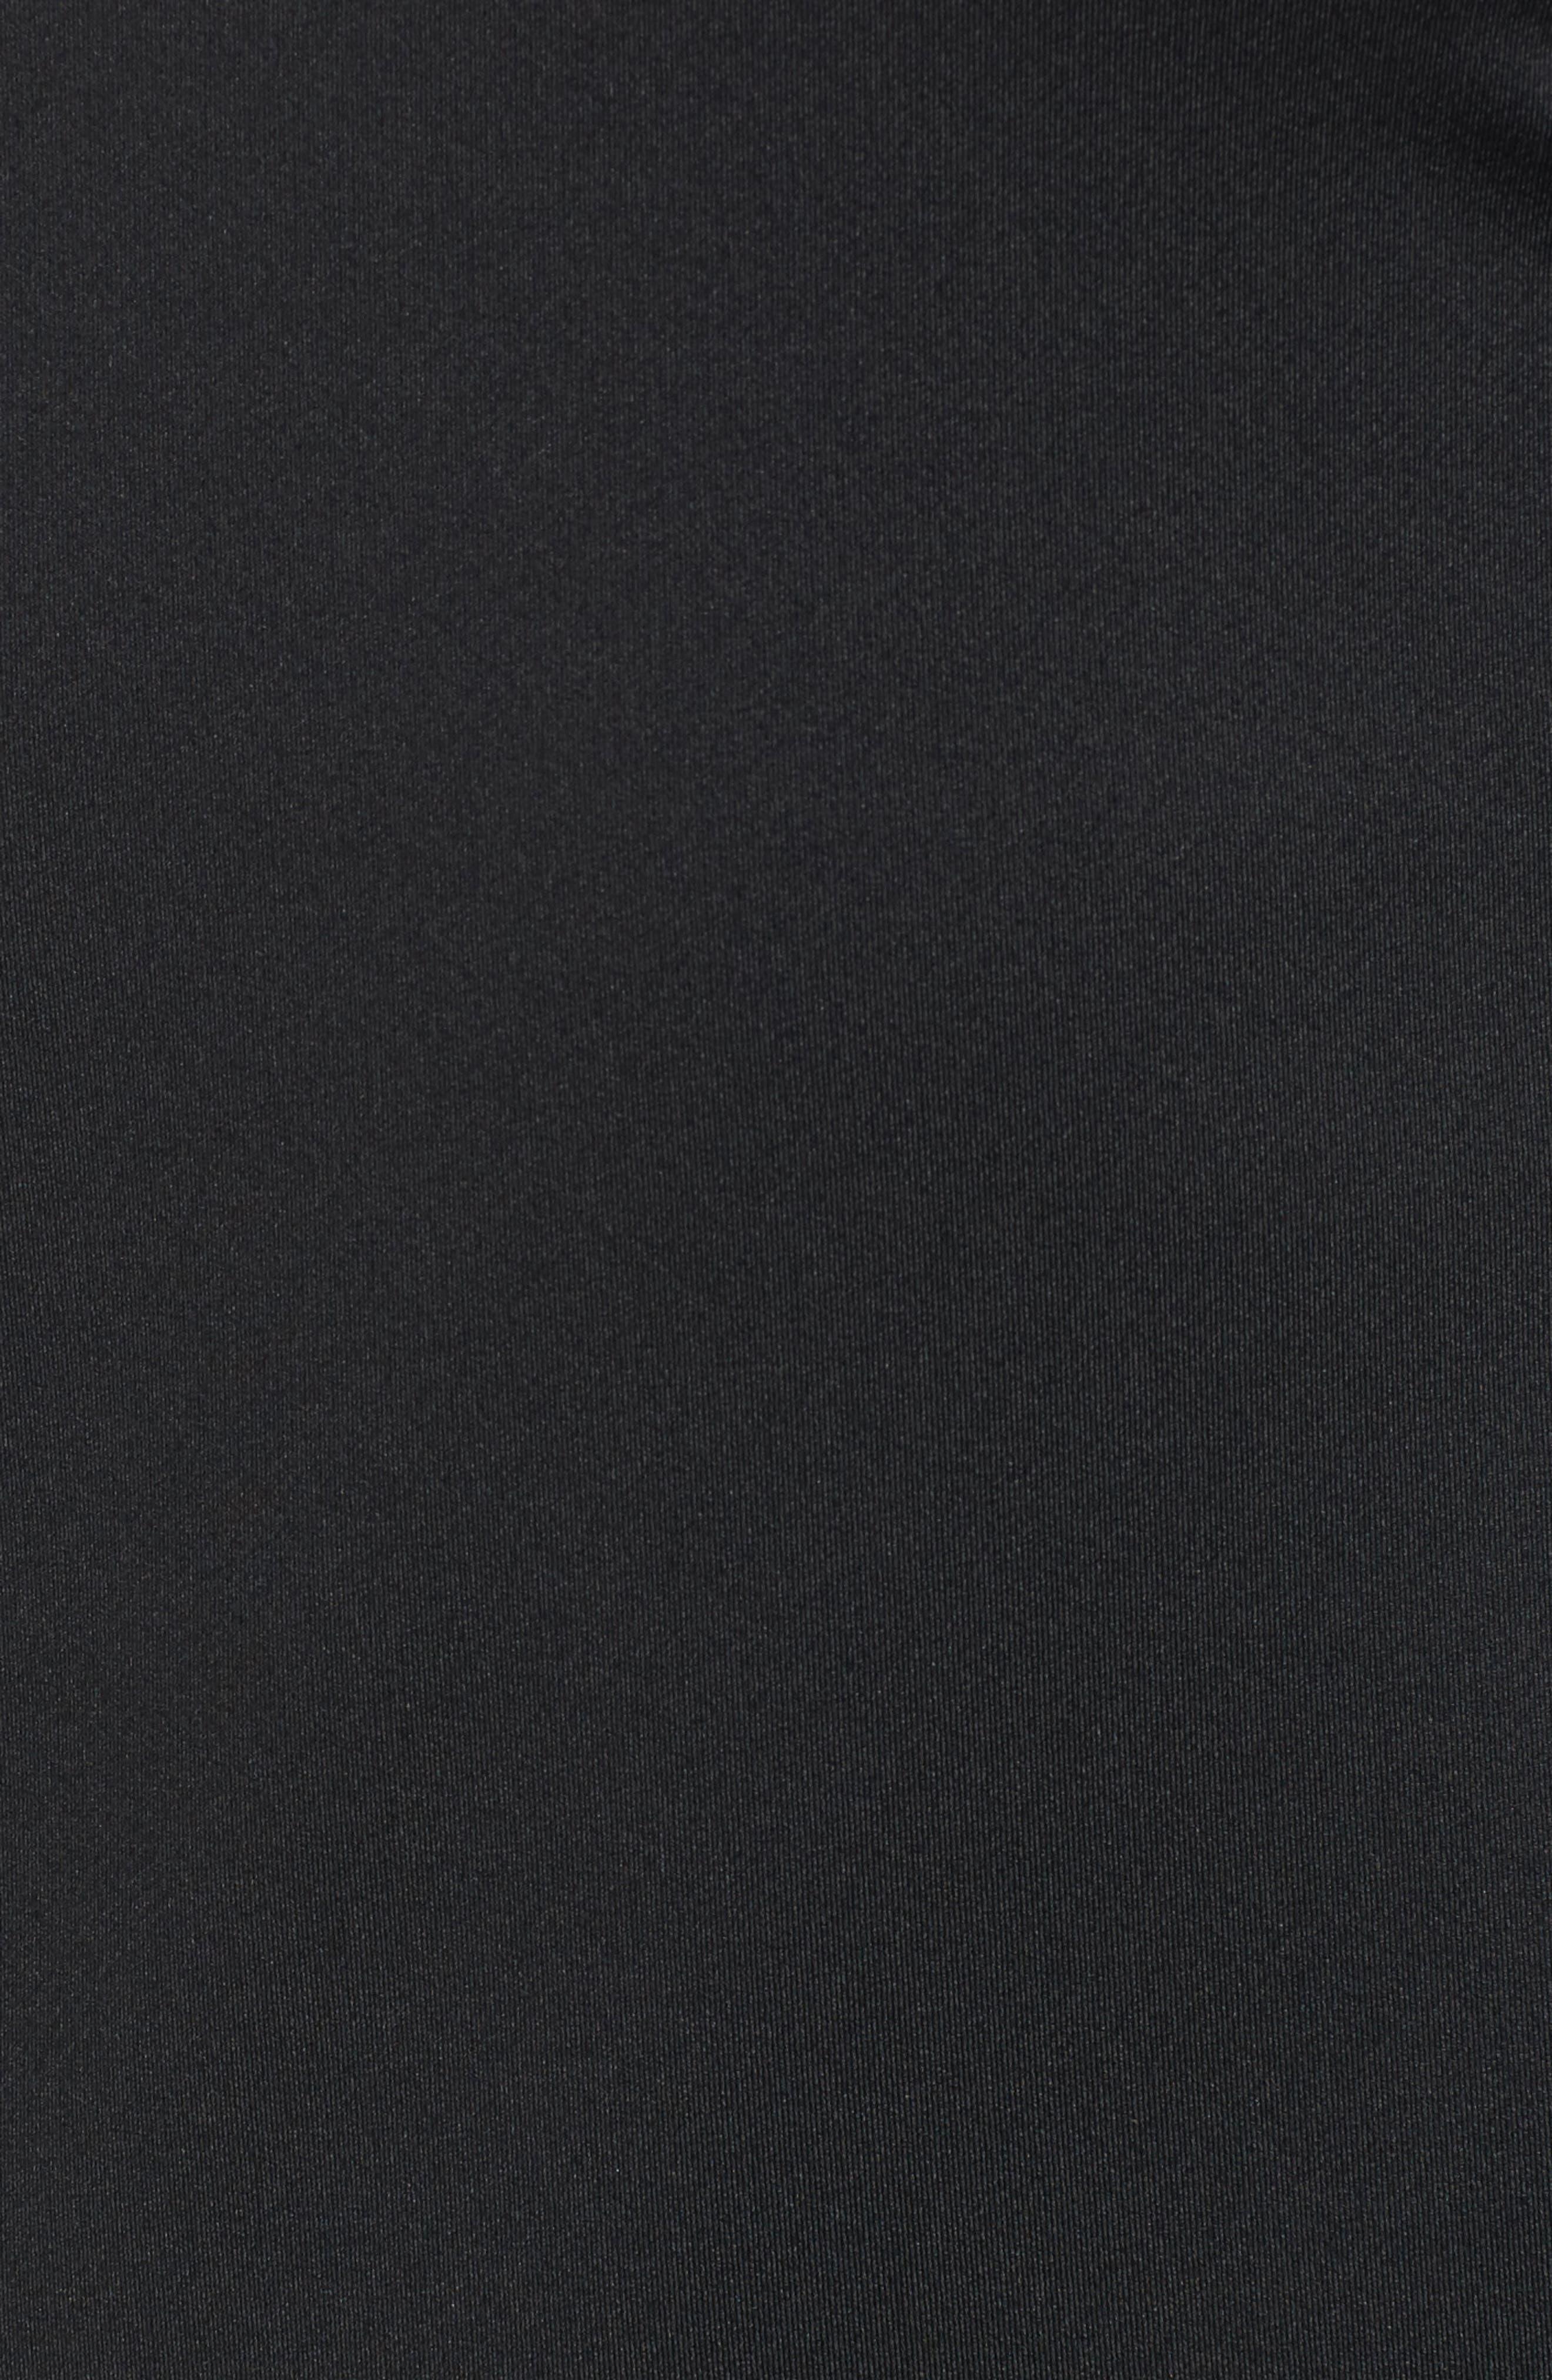 Pro Long Sleeve Training T-Shirt,                             Alternate thumbnail 5, color,                             Black/ Cool Grey/ Cool Grey